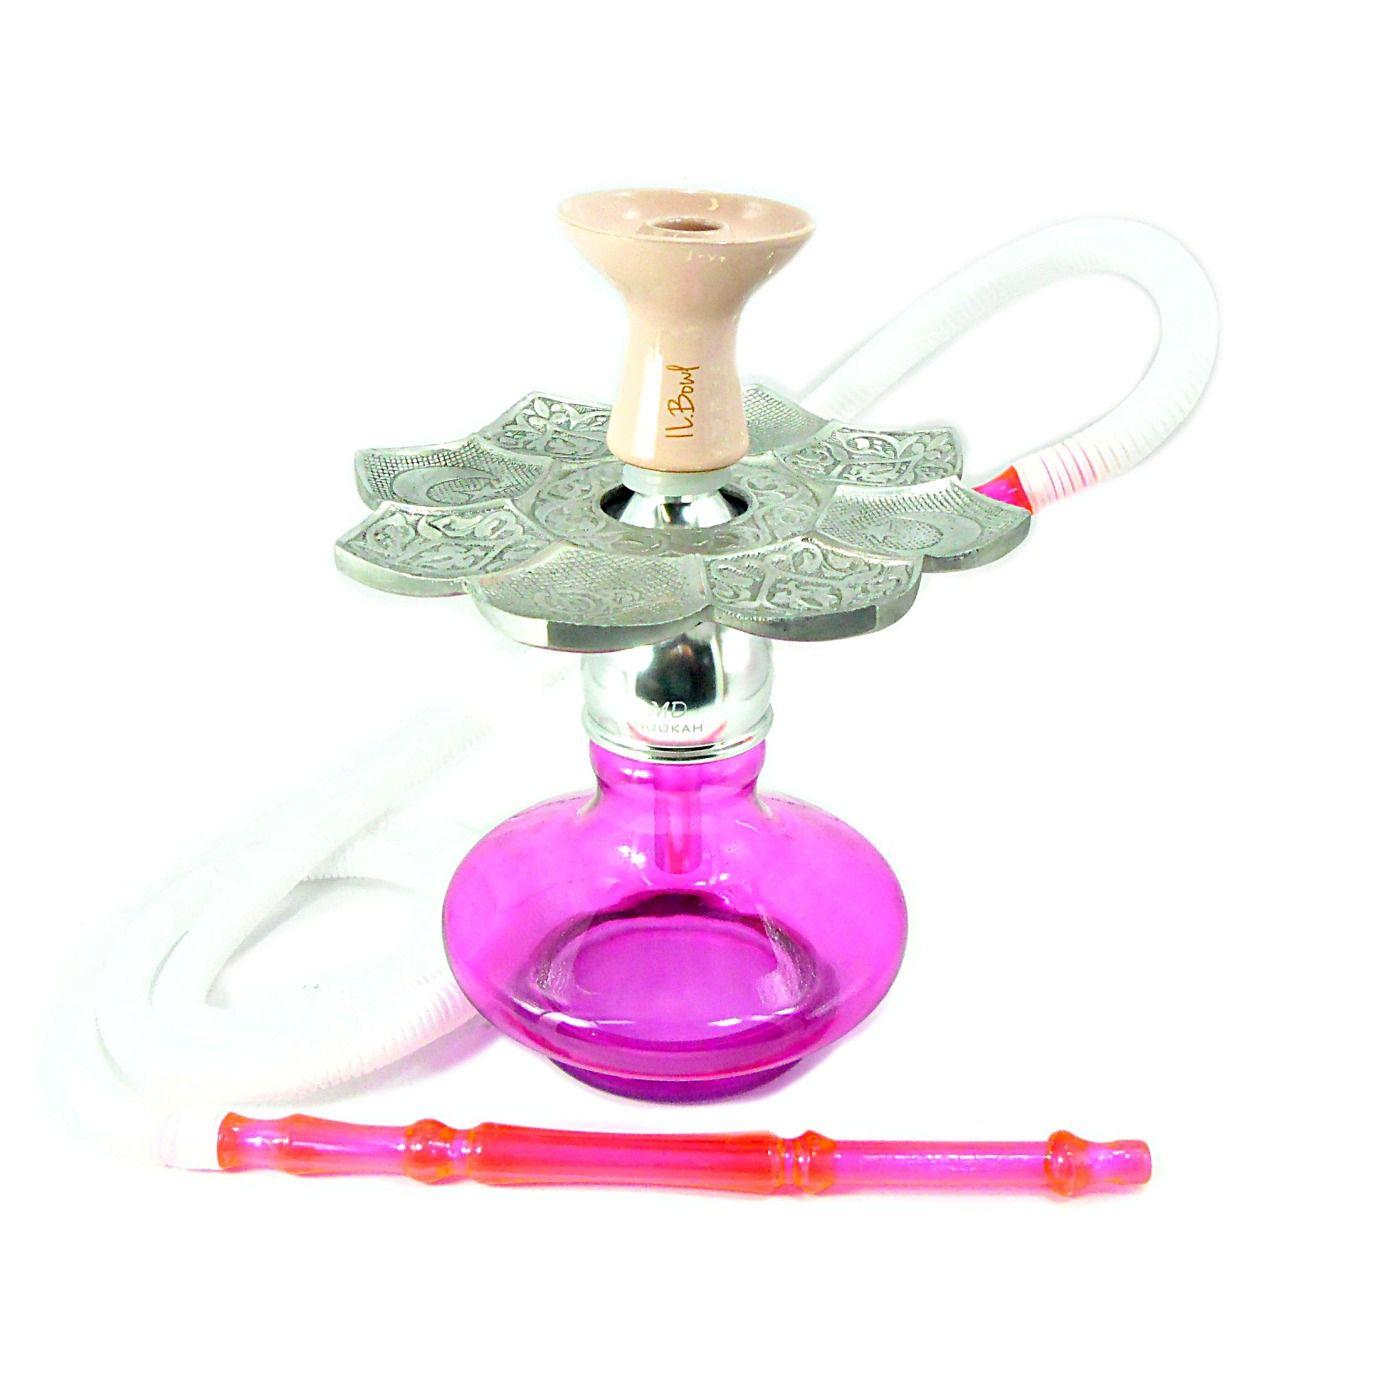 Narguile MD Hookah em alumínio maciço, vaso Aladin rosa, mangueira lavável, prato El Nefes, rosh IL Bowl